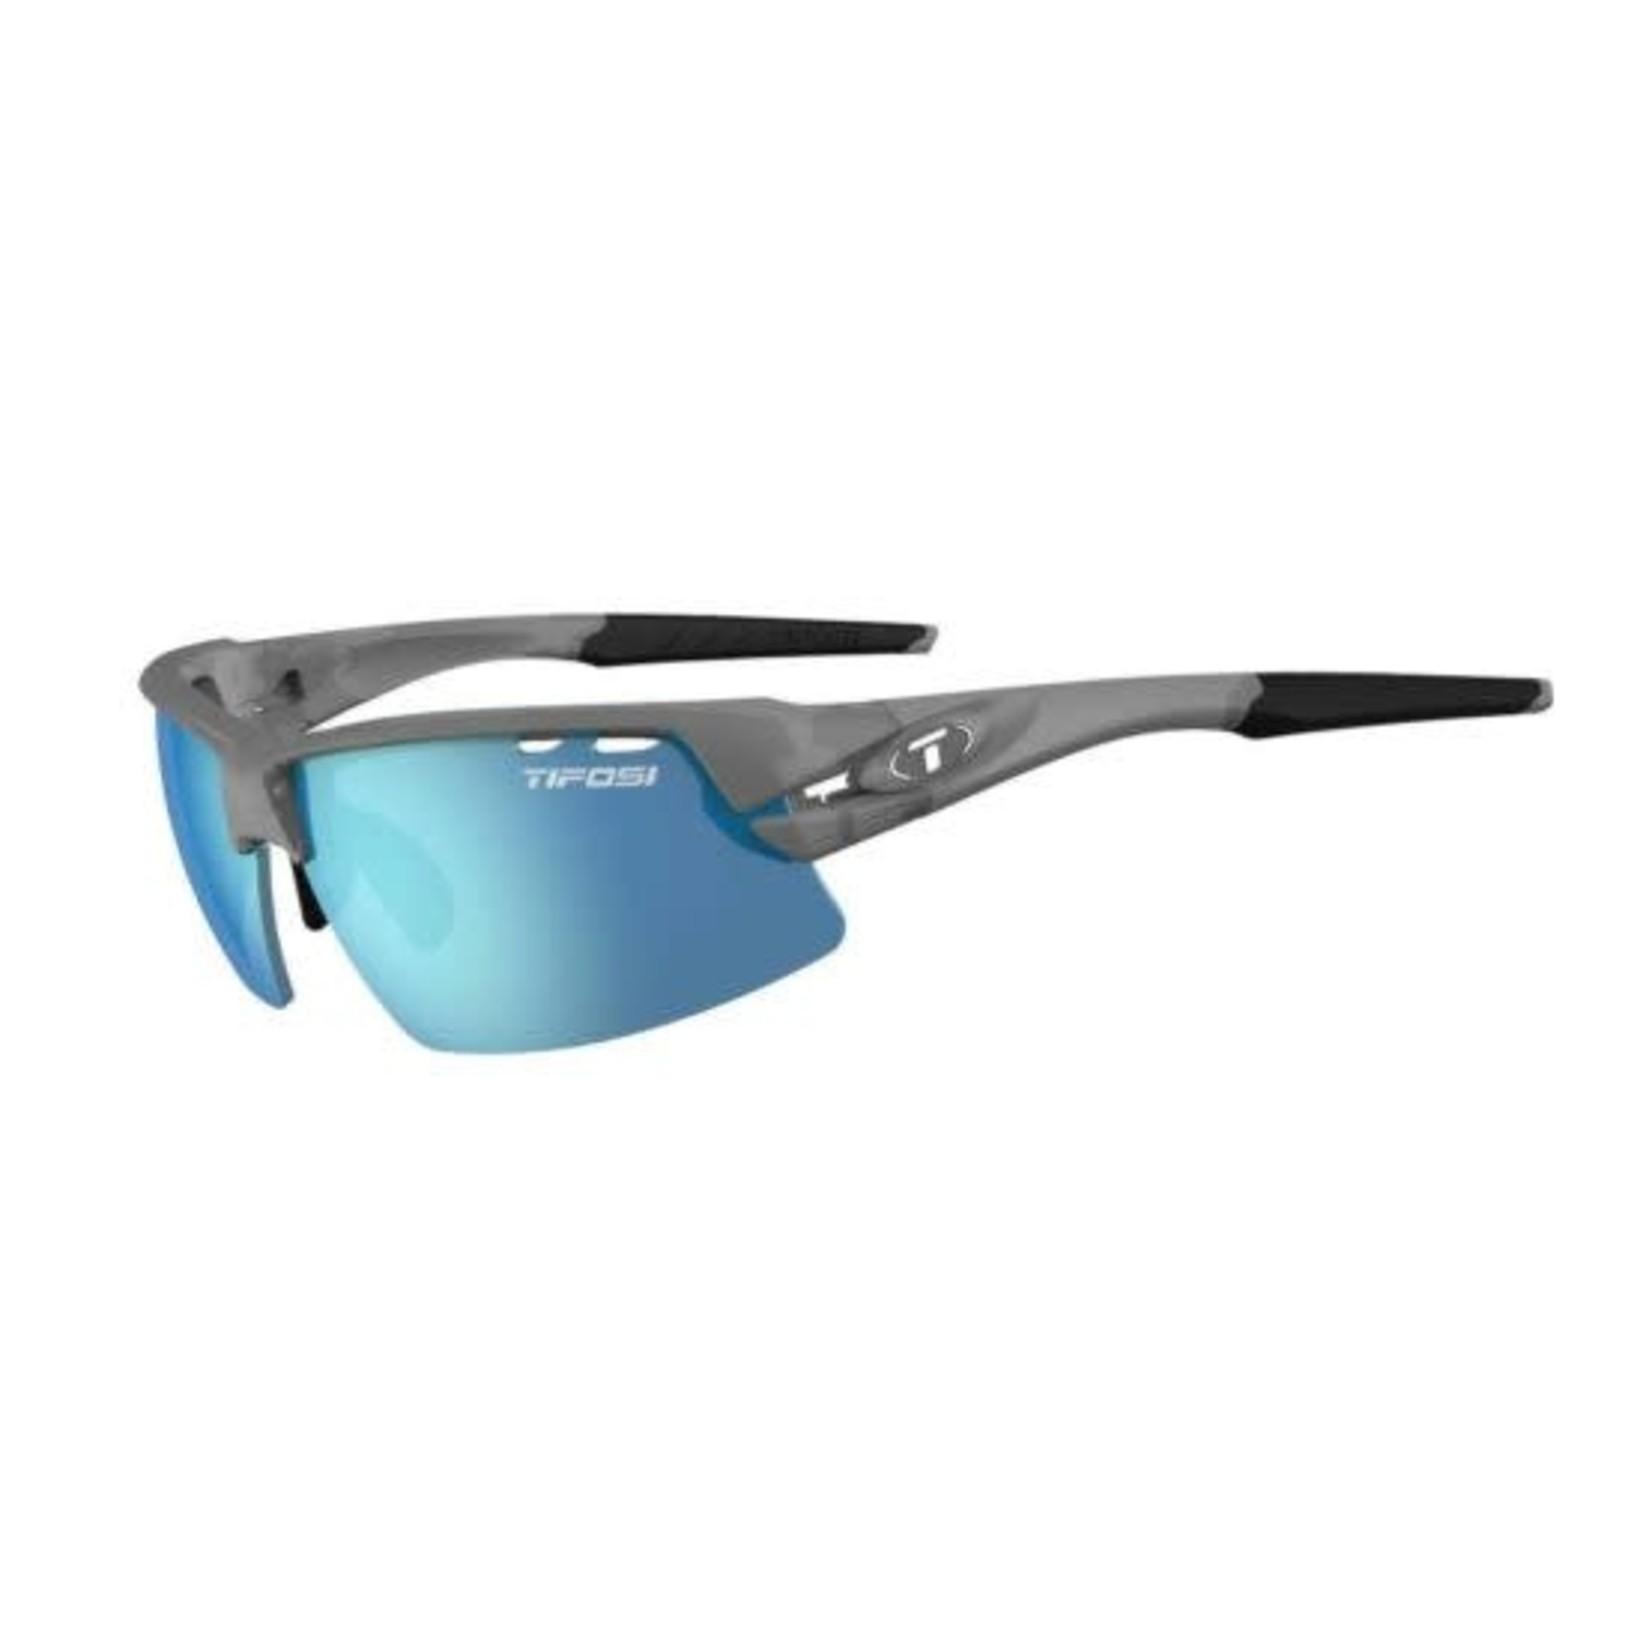 Tifosi Optics Crit, Matte Smoke Fototec Sunglasses